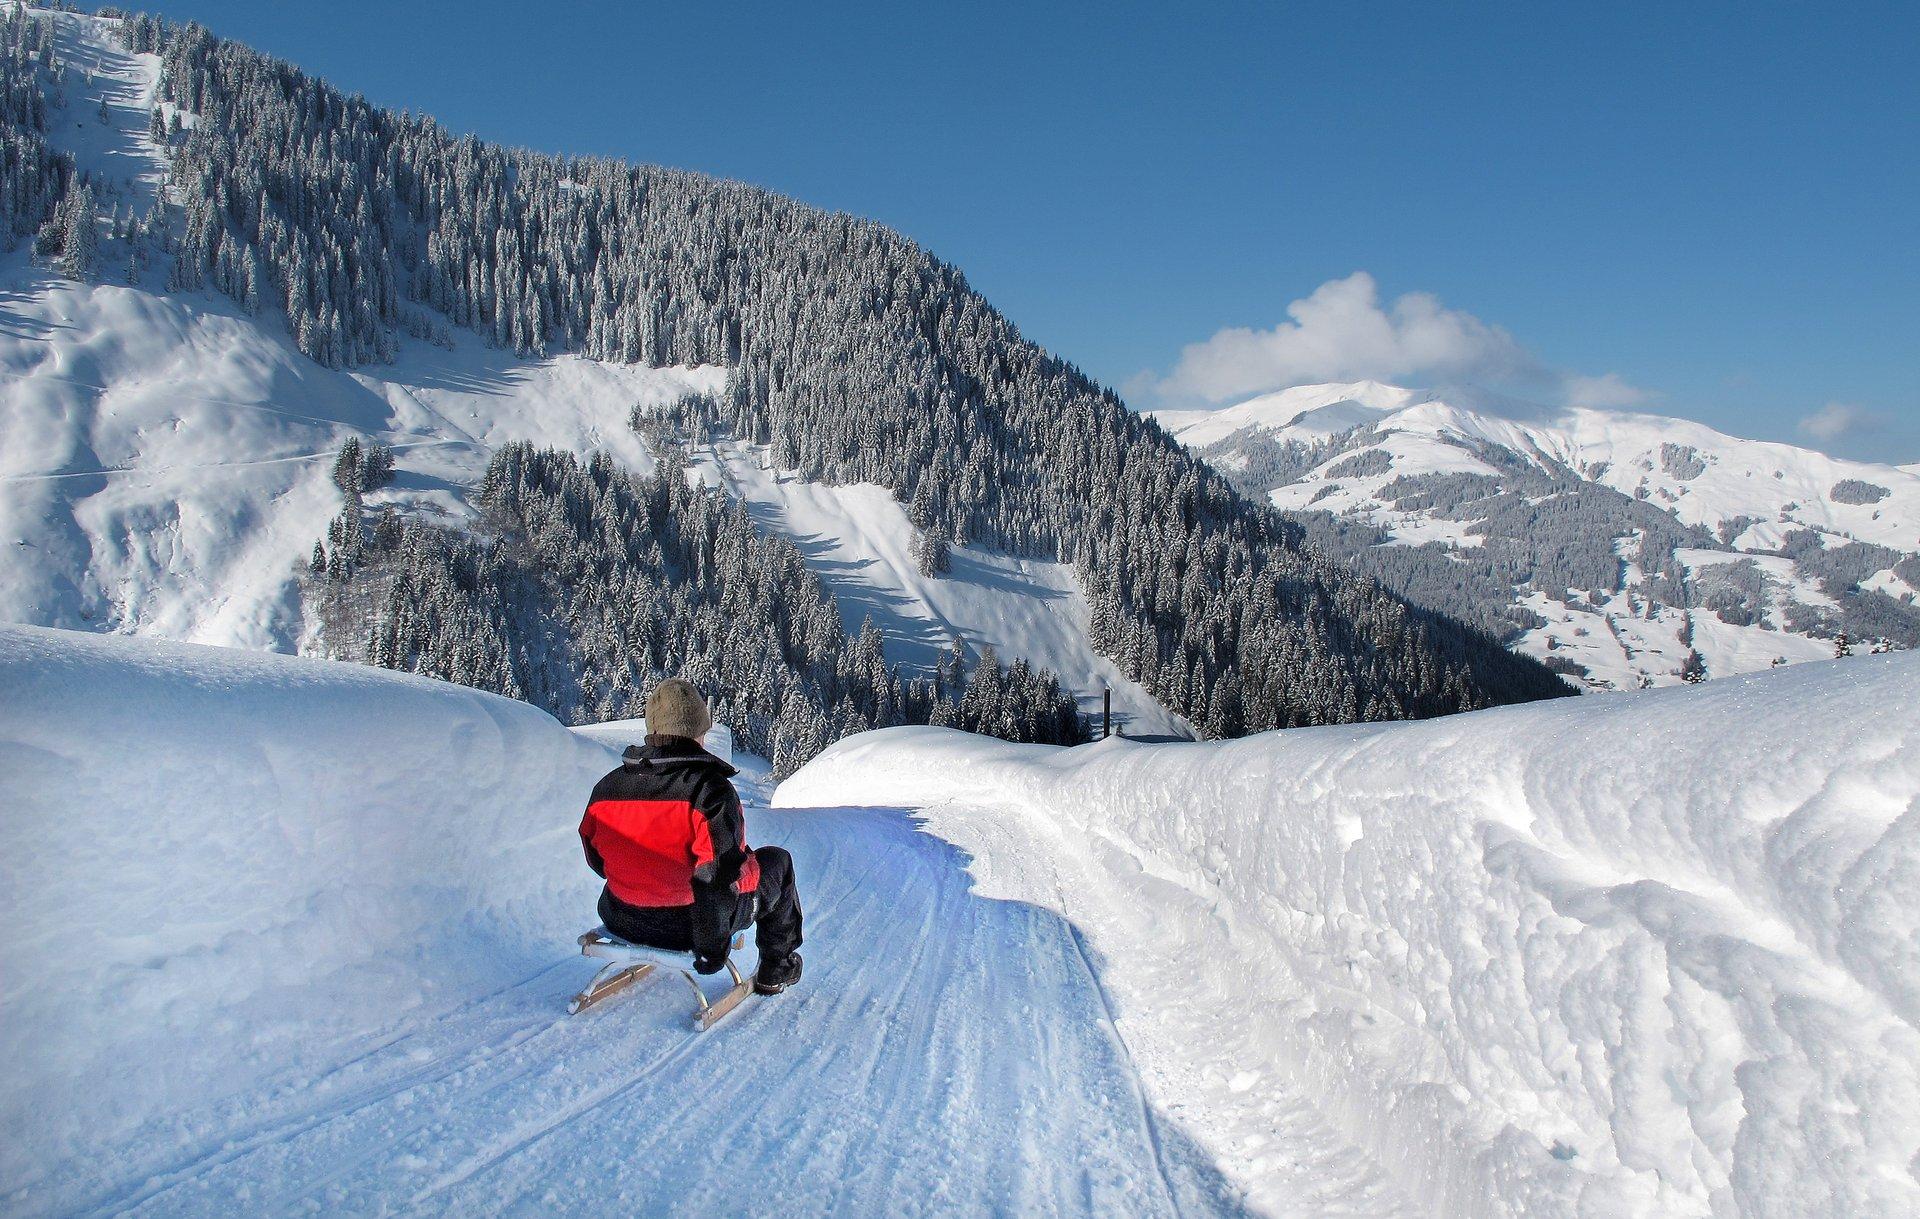 Tobogganing in Austria 2020 - Best Time